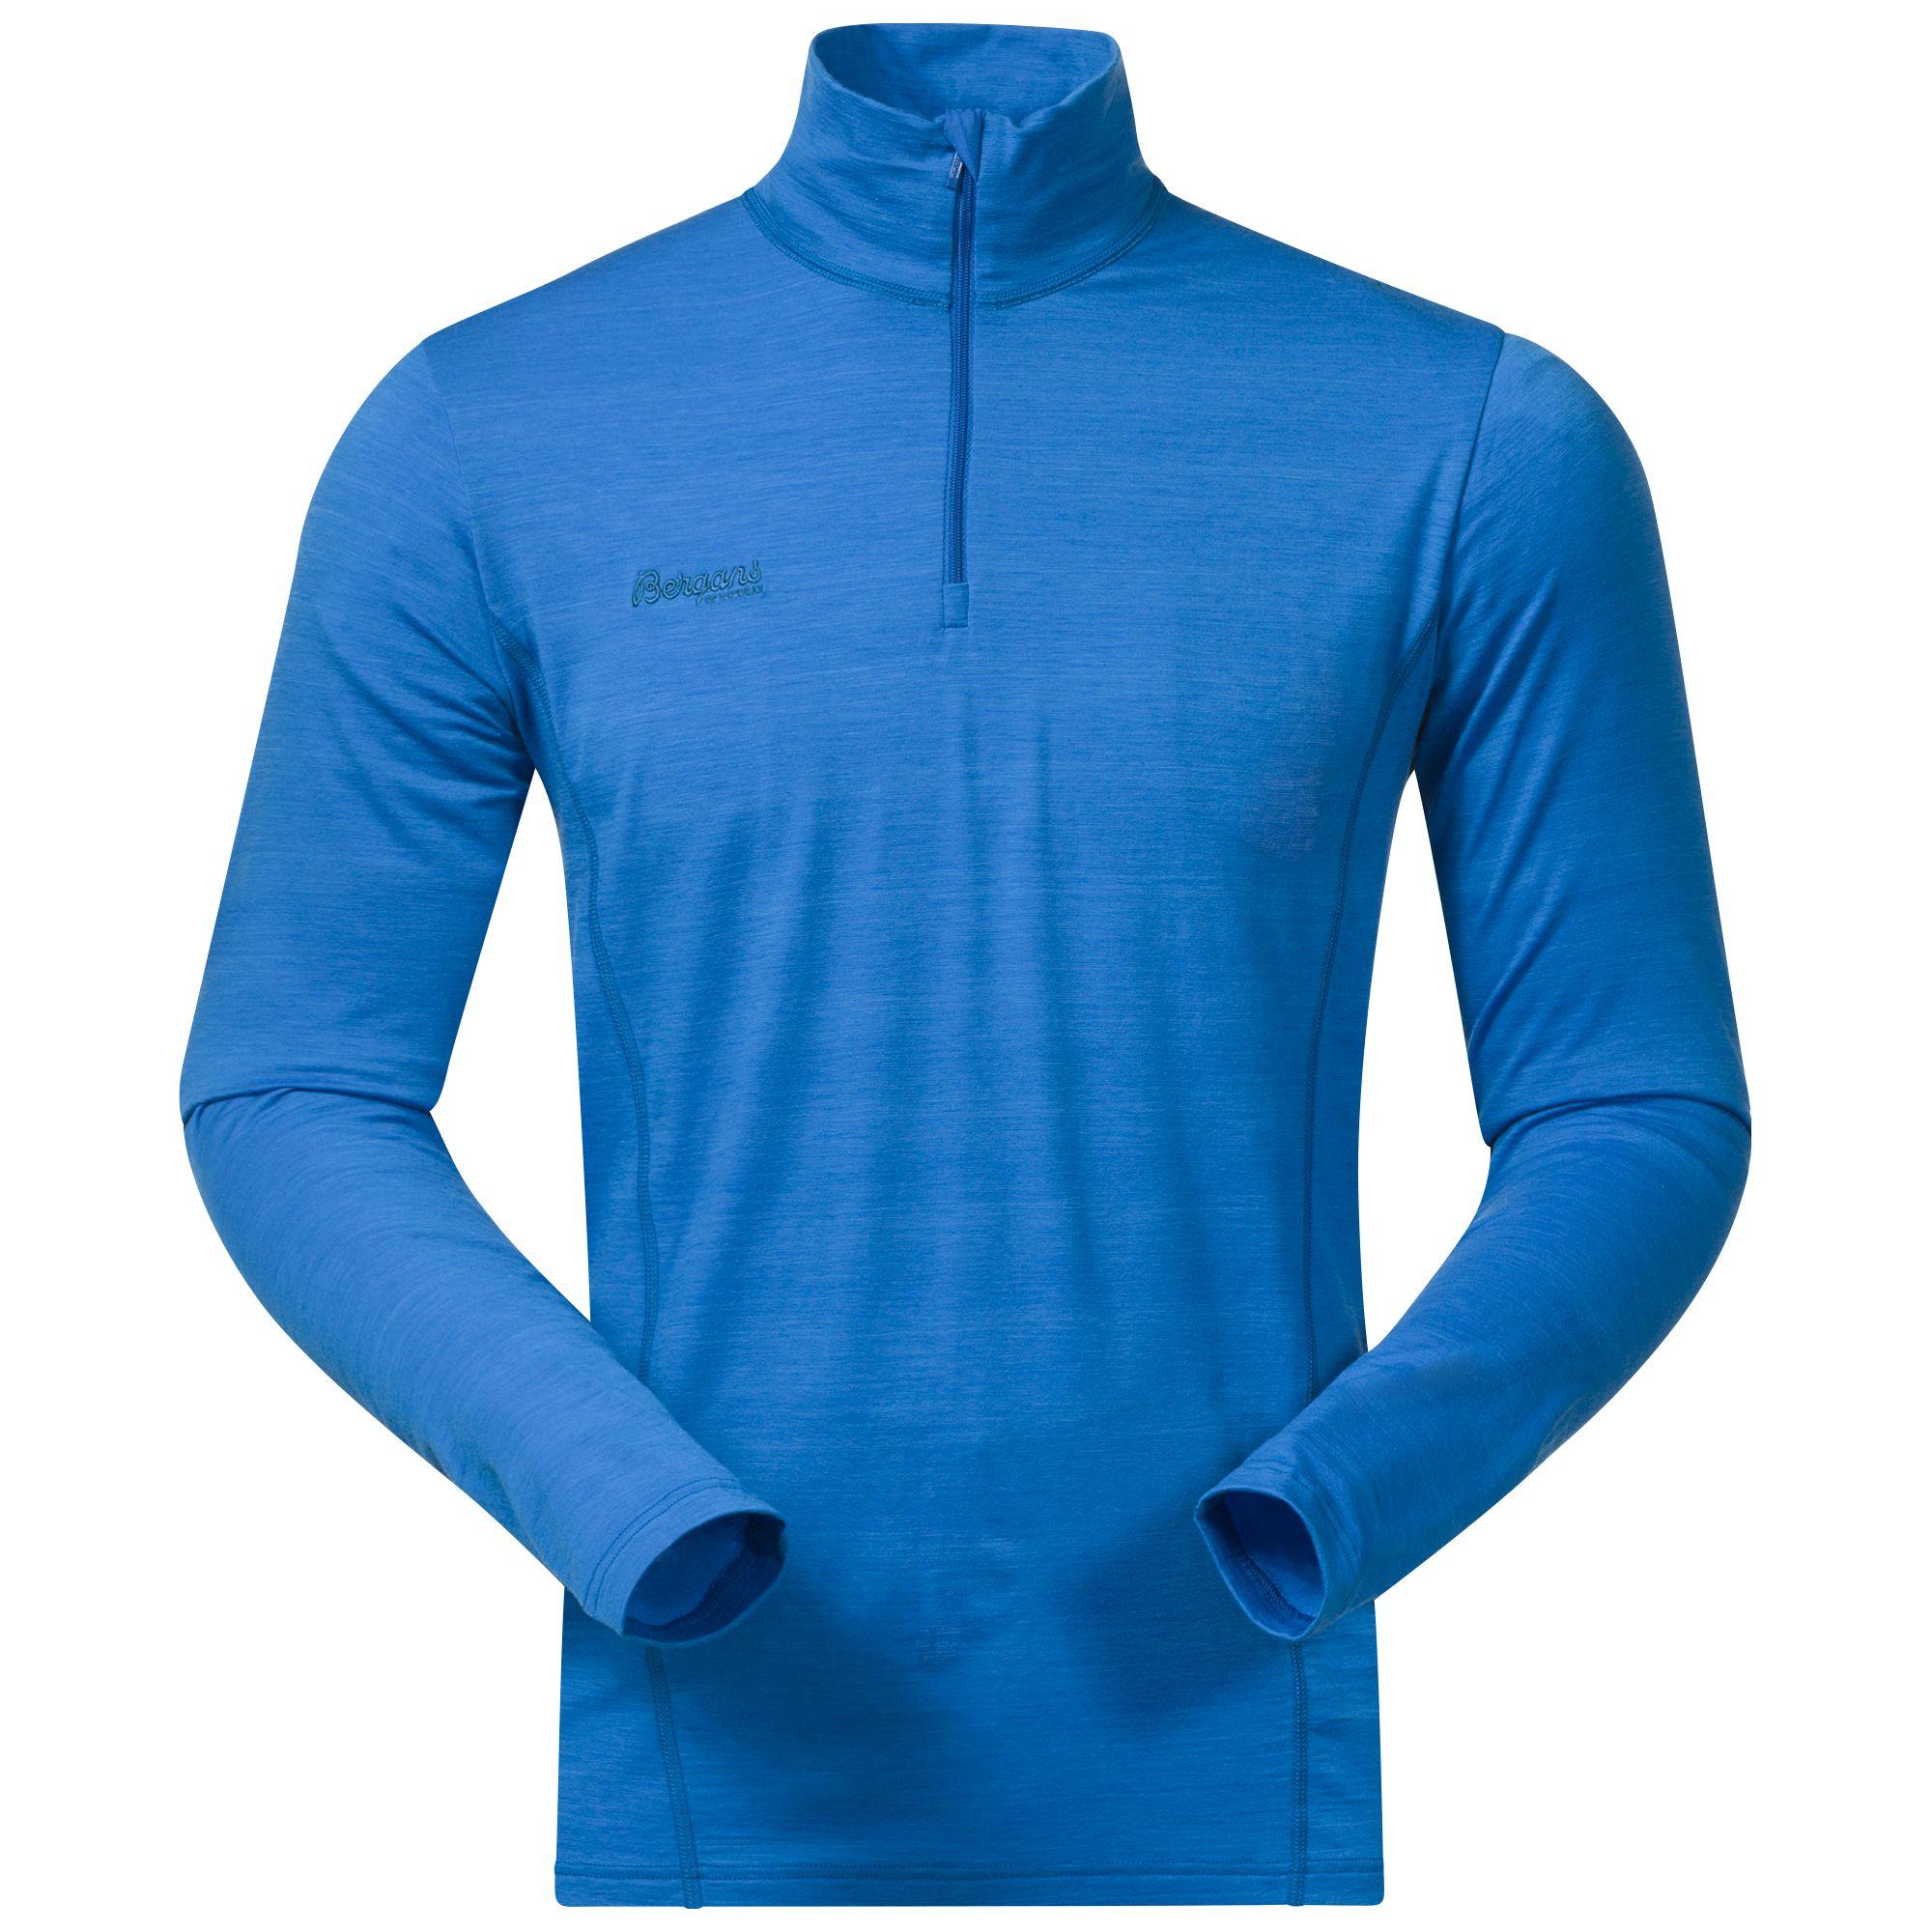 Bluza De Corp Bergans Soleie Half Zip - Albastru